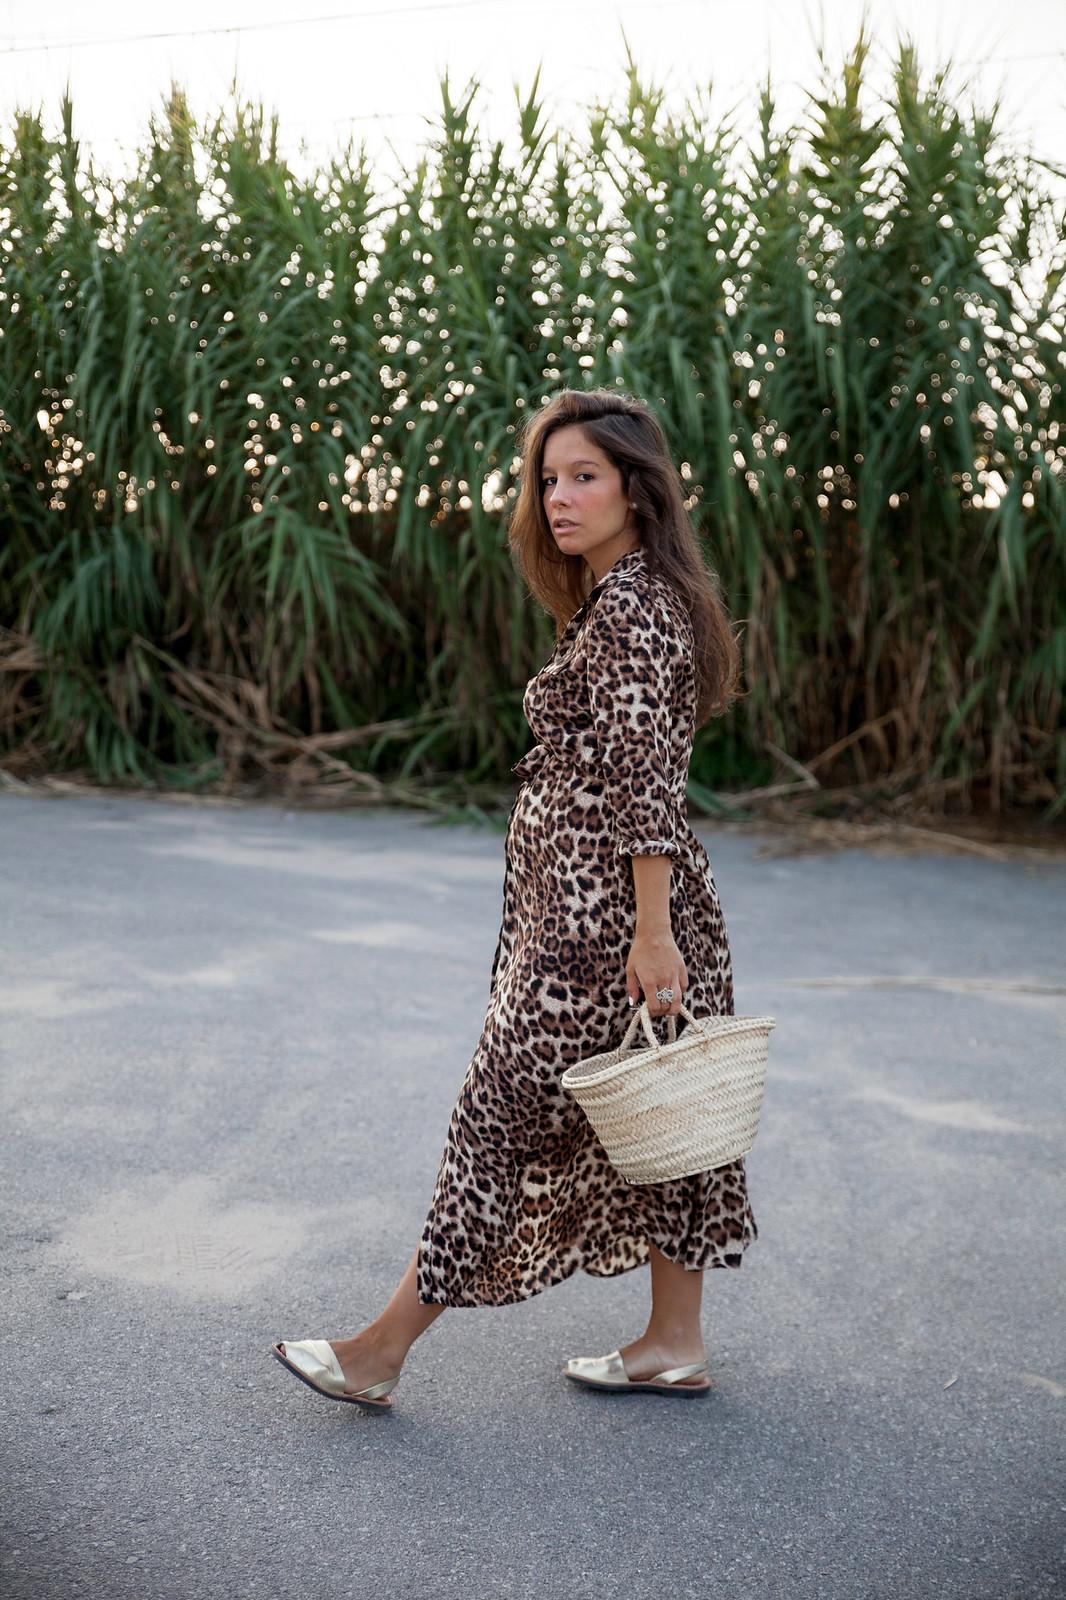 07_leopardo_estampado_tendencia_otoño_18_19_theguestgirl_leopard_dress_loavies_pregnant_barcelona_embarazada_influencer_outfit_otoño_vestido_premama